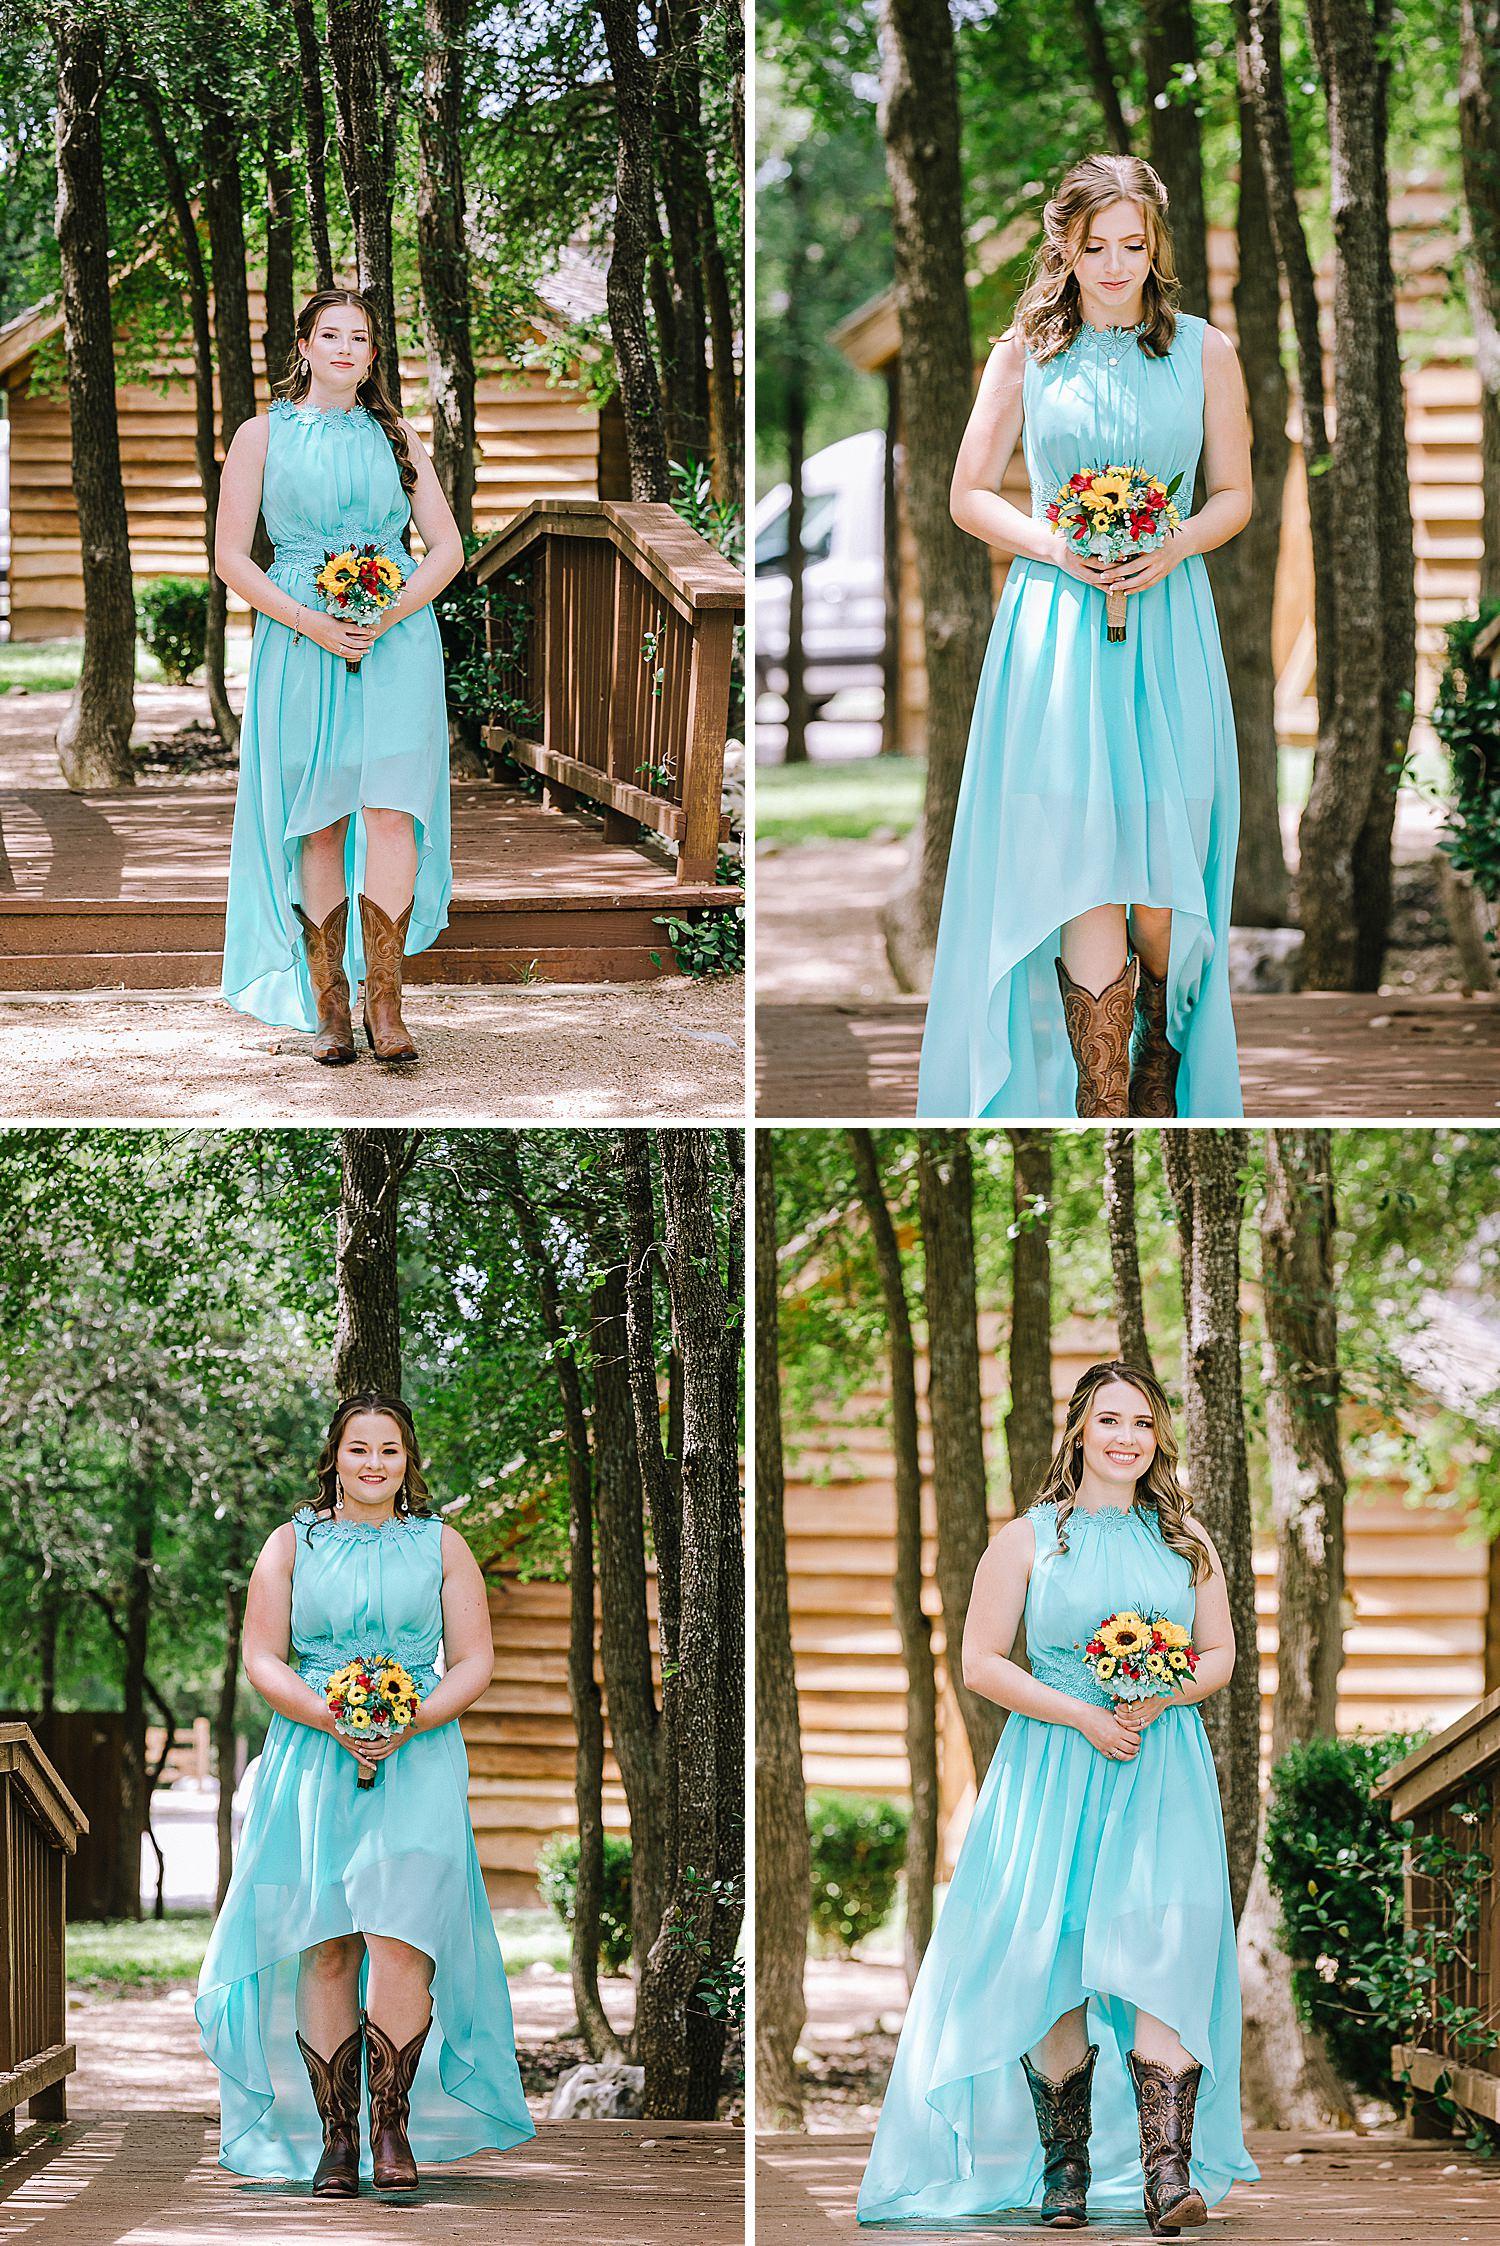 Carly-Barton-Photography-Old-Town-Texas-Rustic-Wedding-Photos-Sunflowers-Boots-Kyle-Texas_0033.jpg